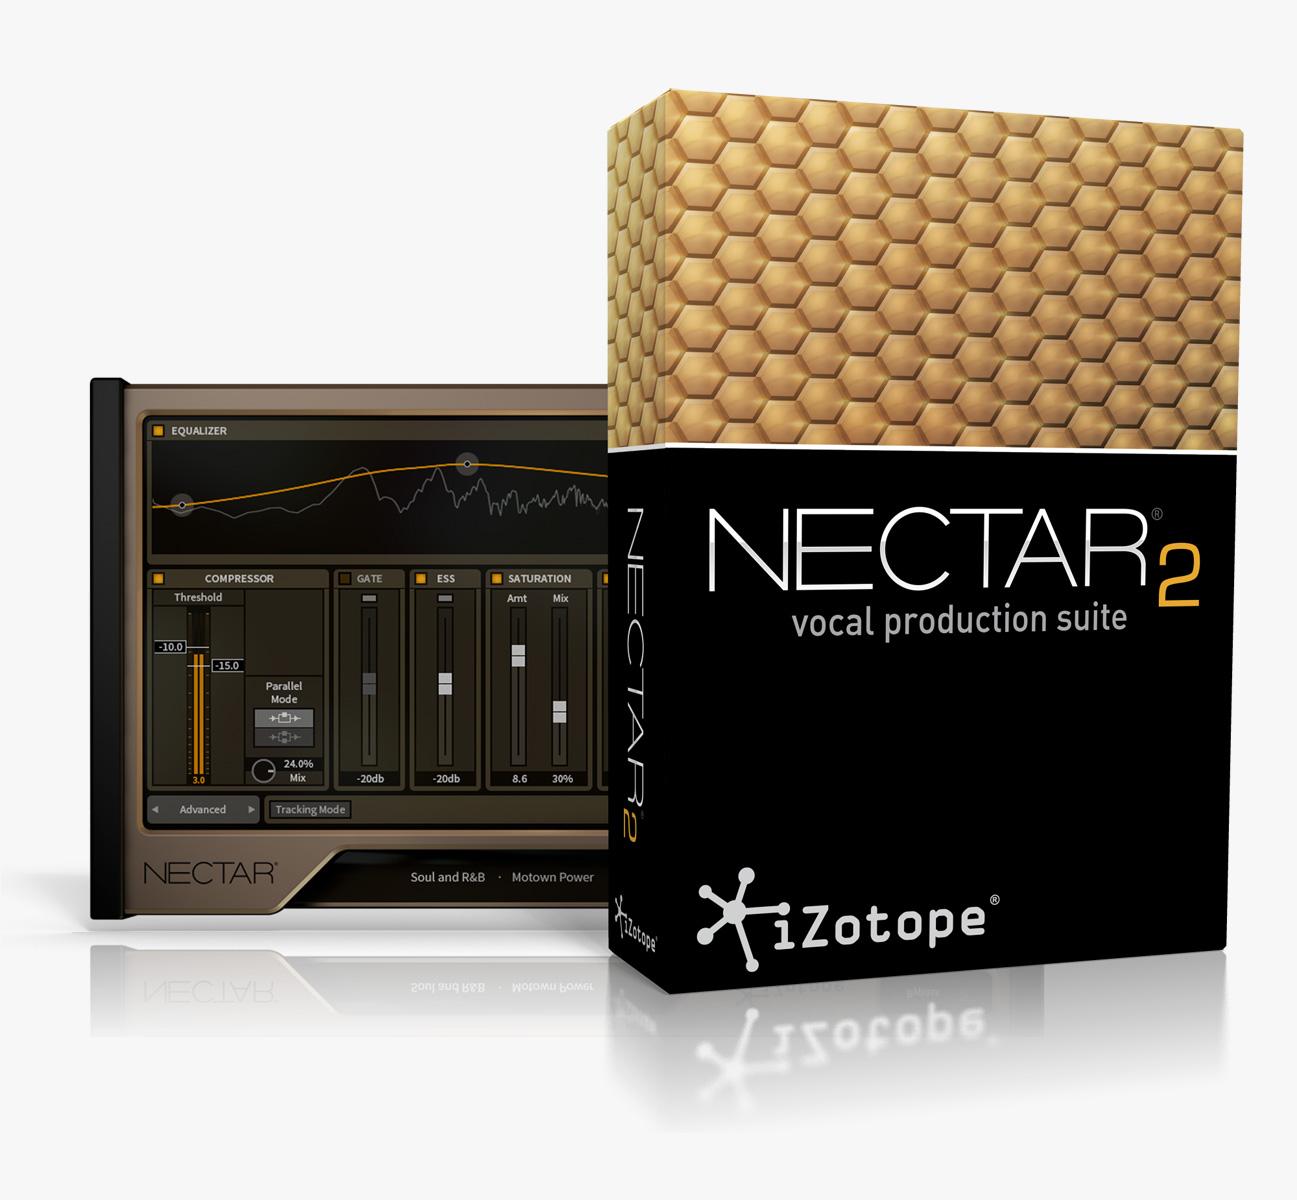 nectar 2 izotope nectar 2 audiofanzine. Black Bedroom Furniture Sets. Home Design Ideas